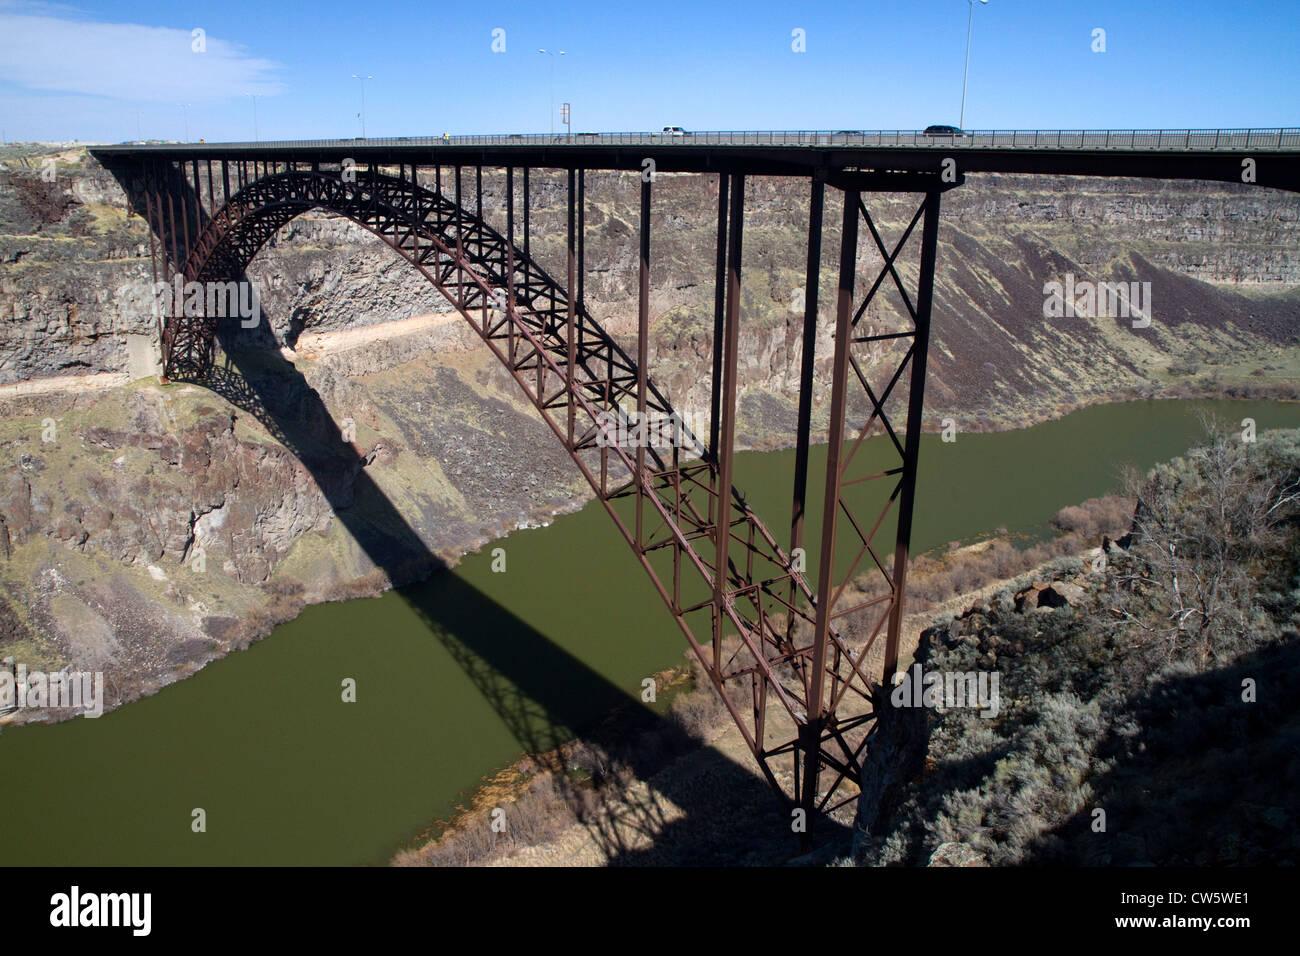 The Ib Perrine Bridge Spans The Snake River Canyon At Twin Falls